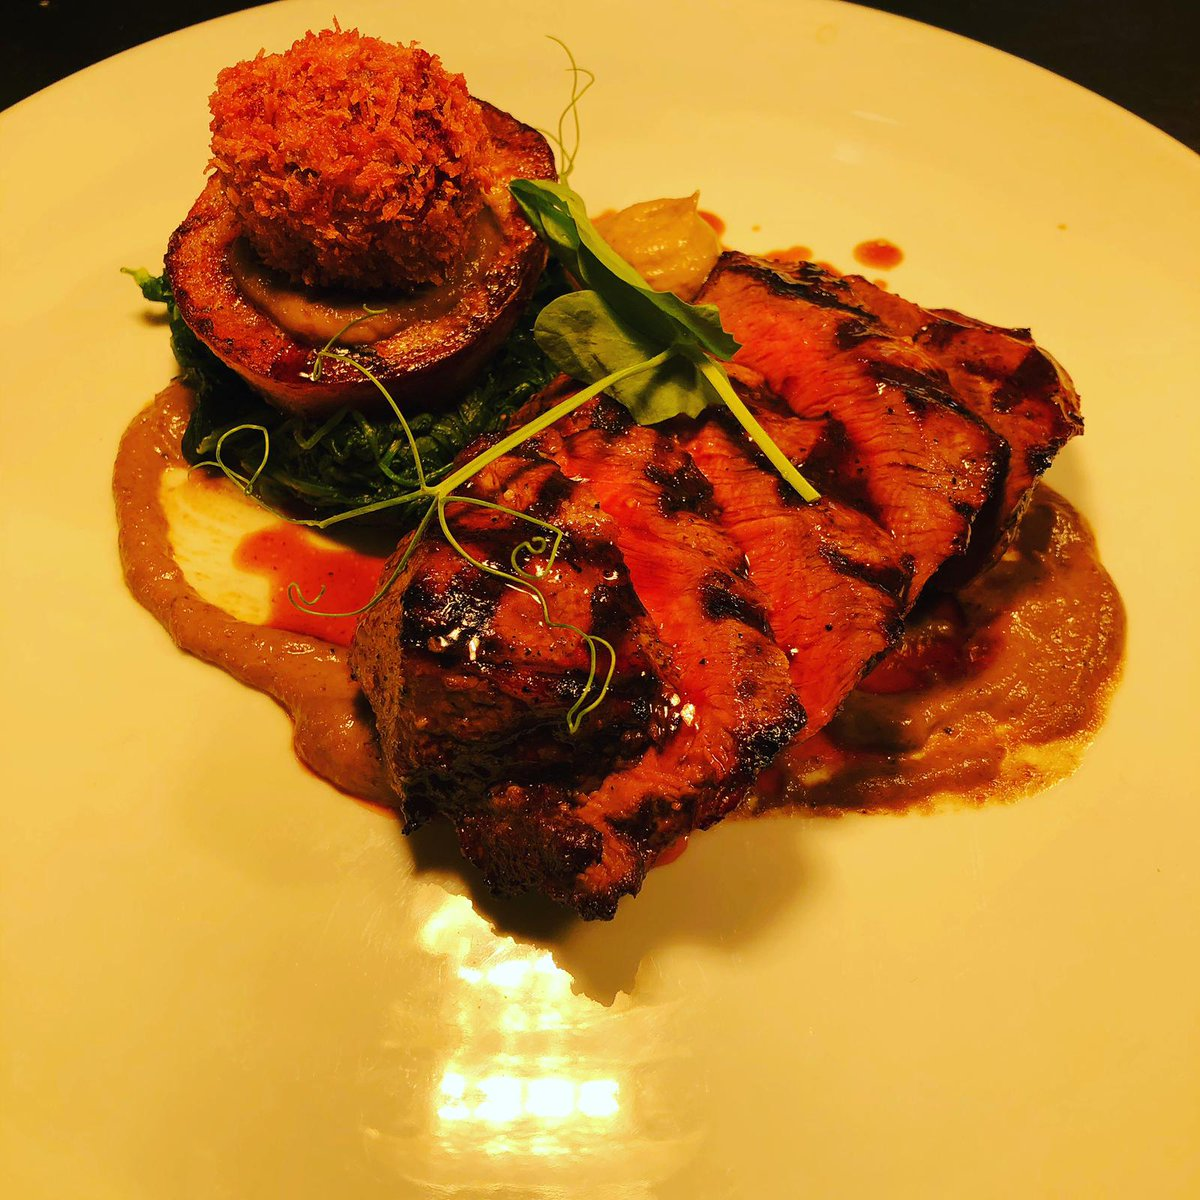 Featherblade of beef looking stunning.... #beef #localbusiness #localfood #mediumrare #delish #burystedmunds #freshfood #foodie #burystedmundsfood #foods #food